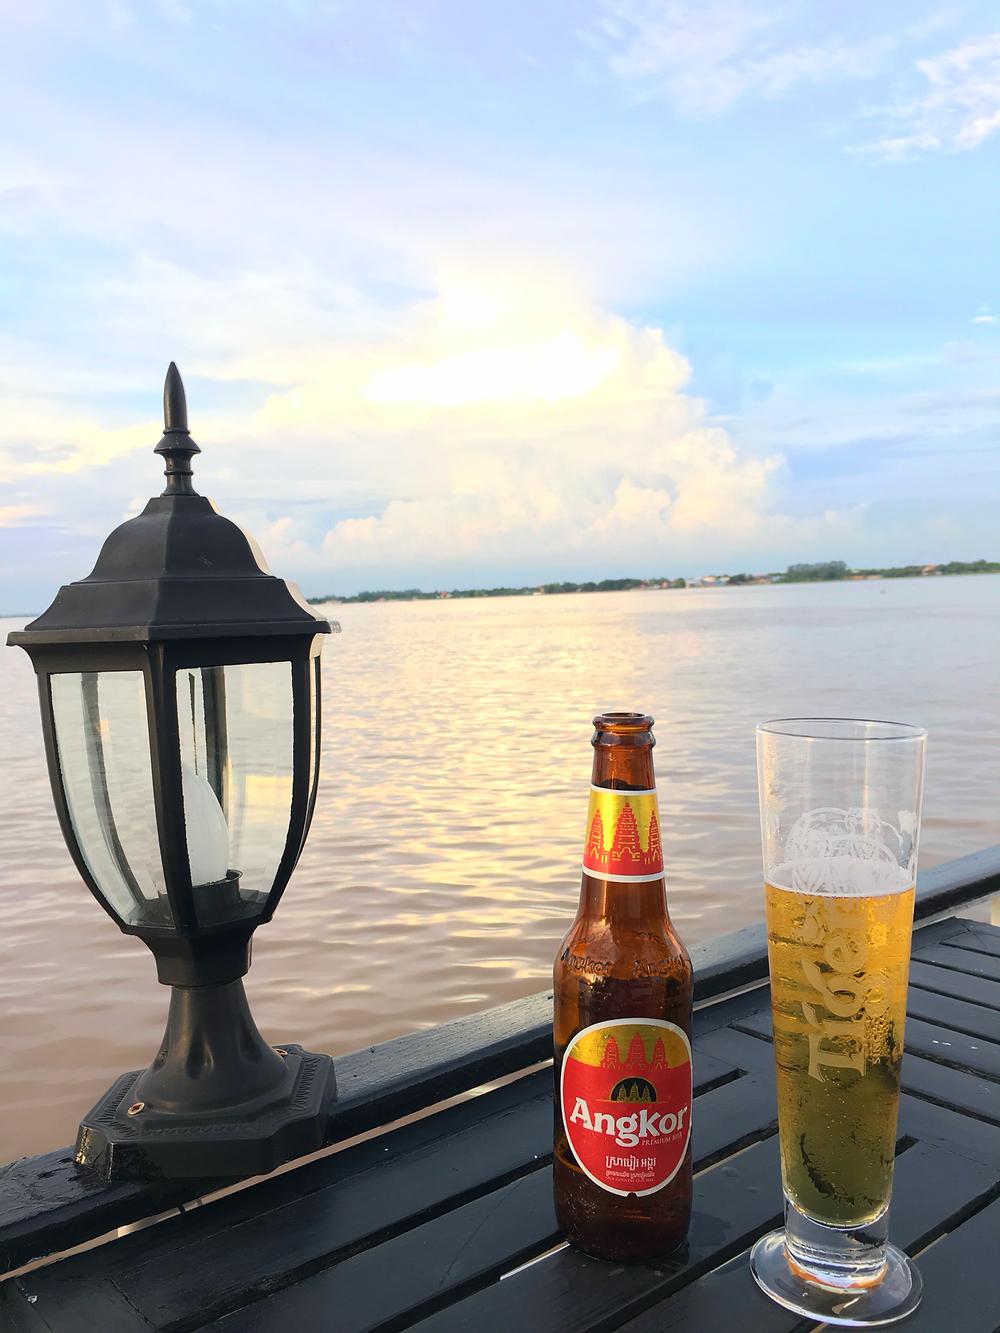 Enjoying a beverage while sailing along the Tonle Sap